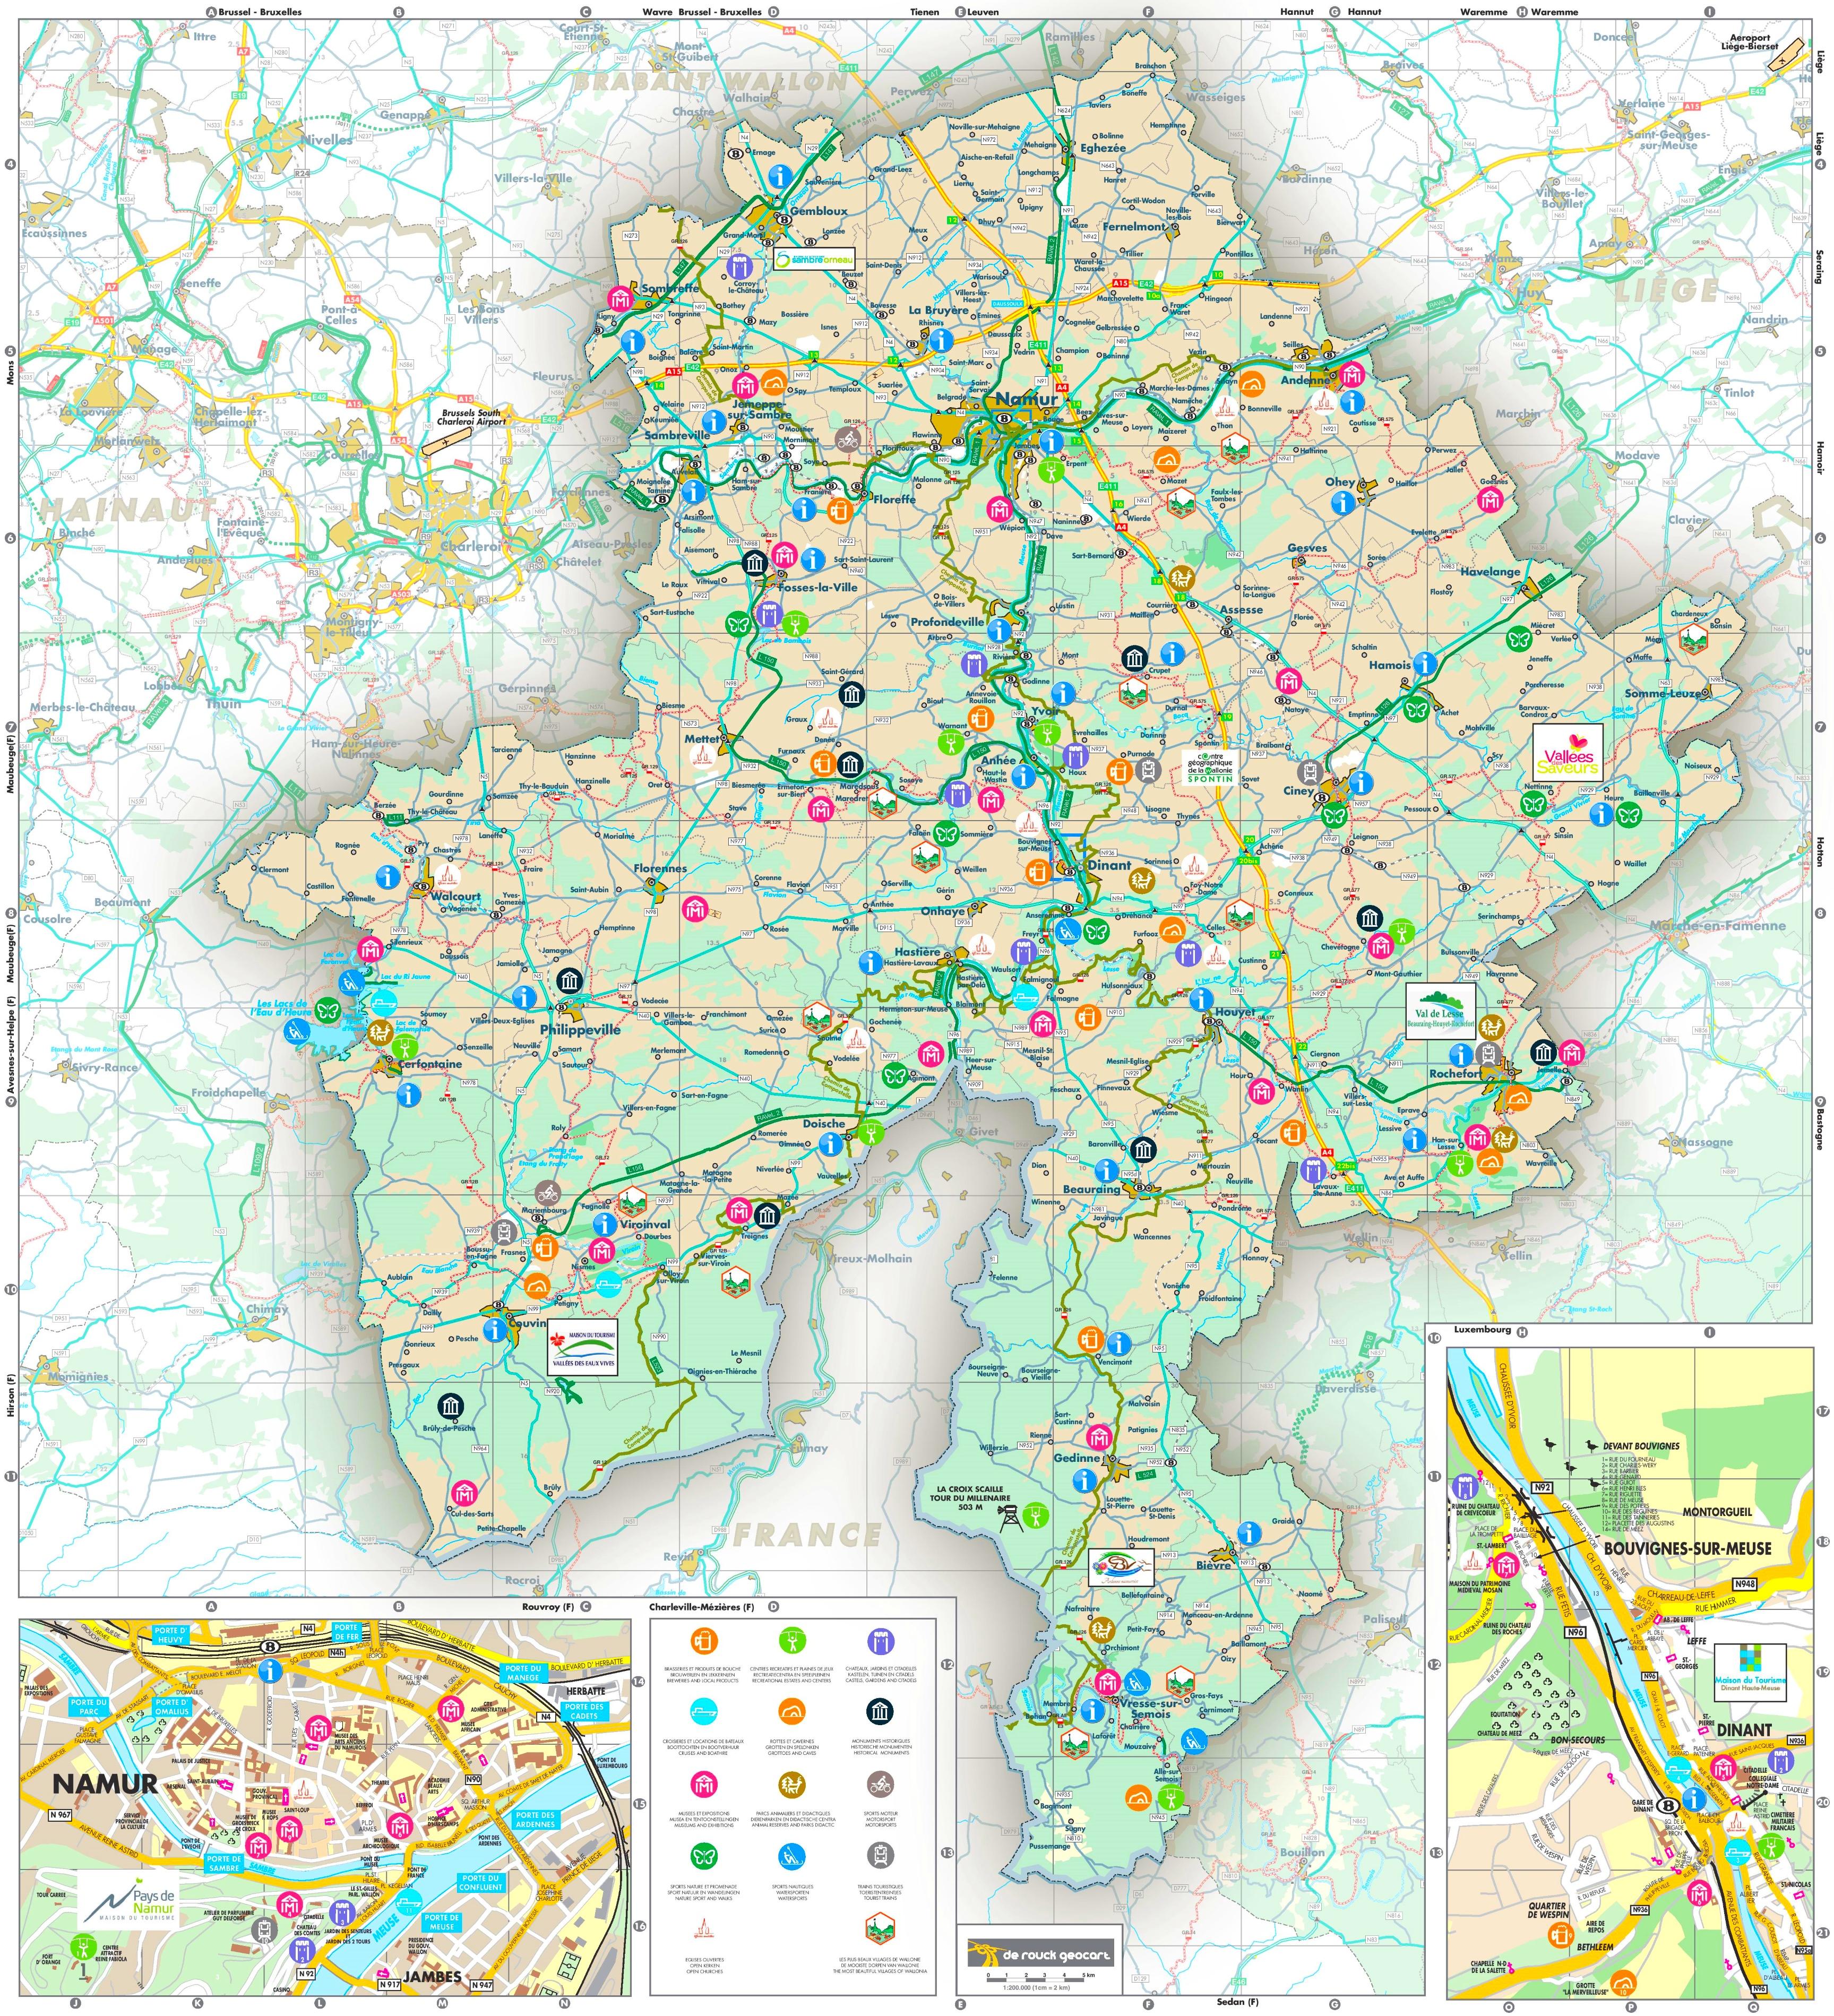 Namur province tourist map